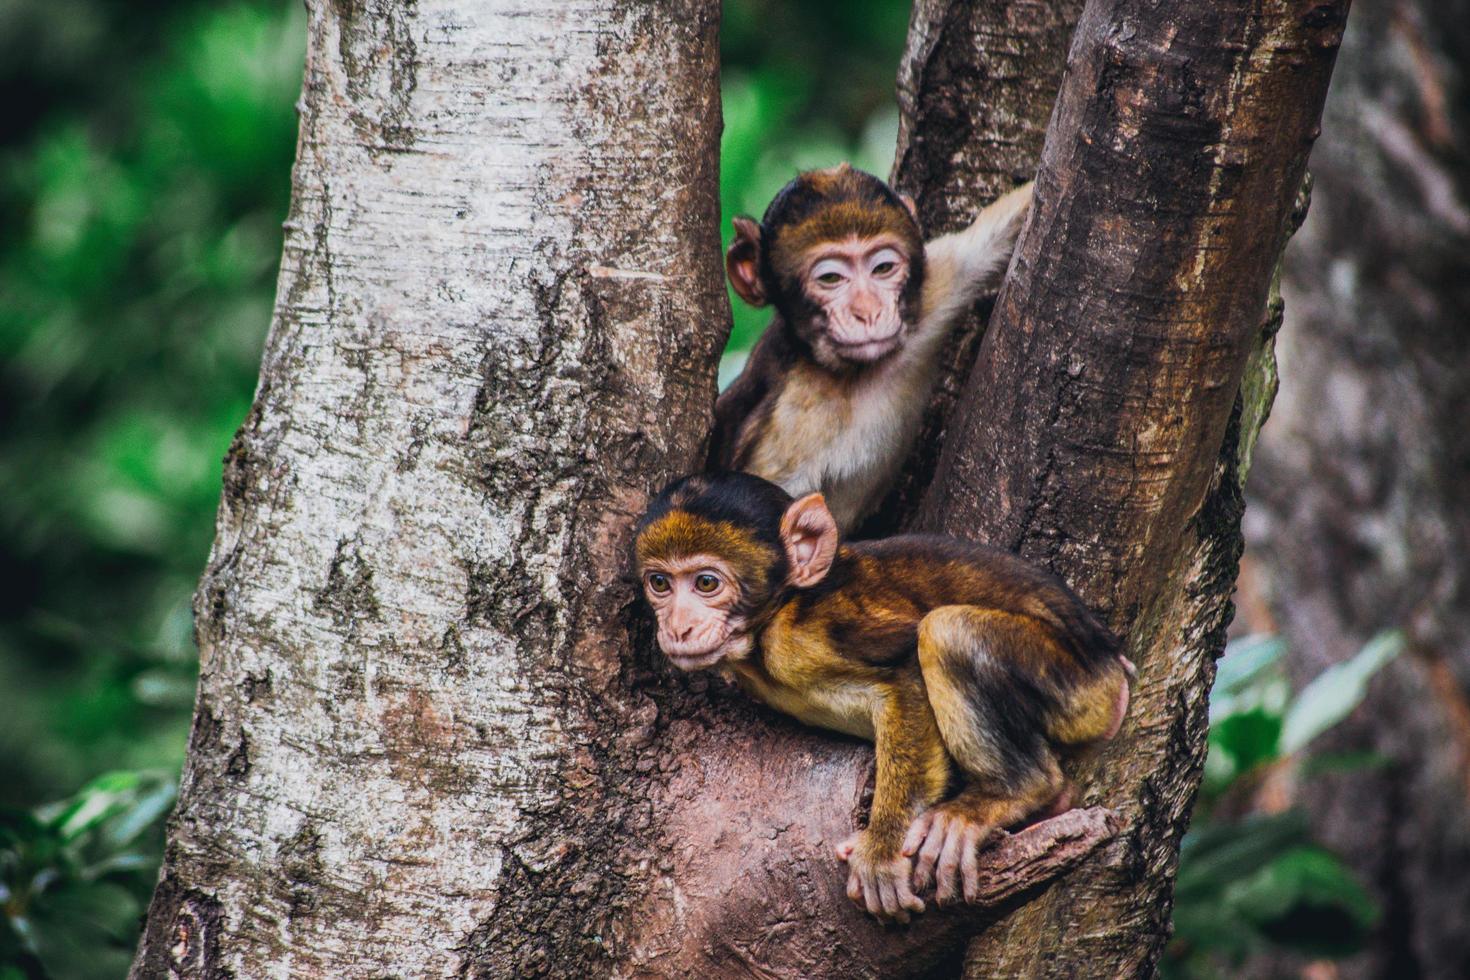 Two brown monkeys in a tree photo